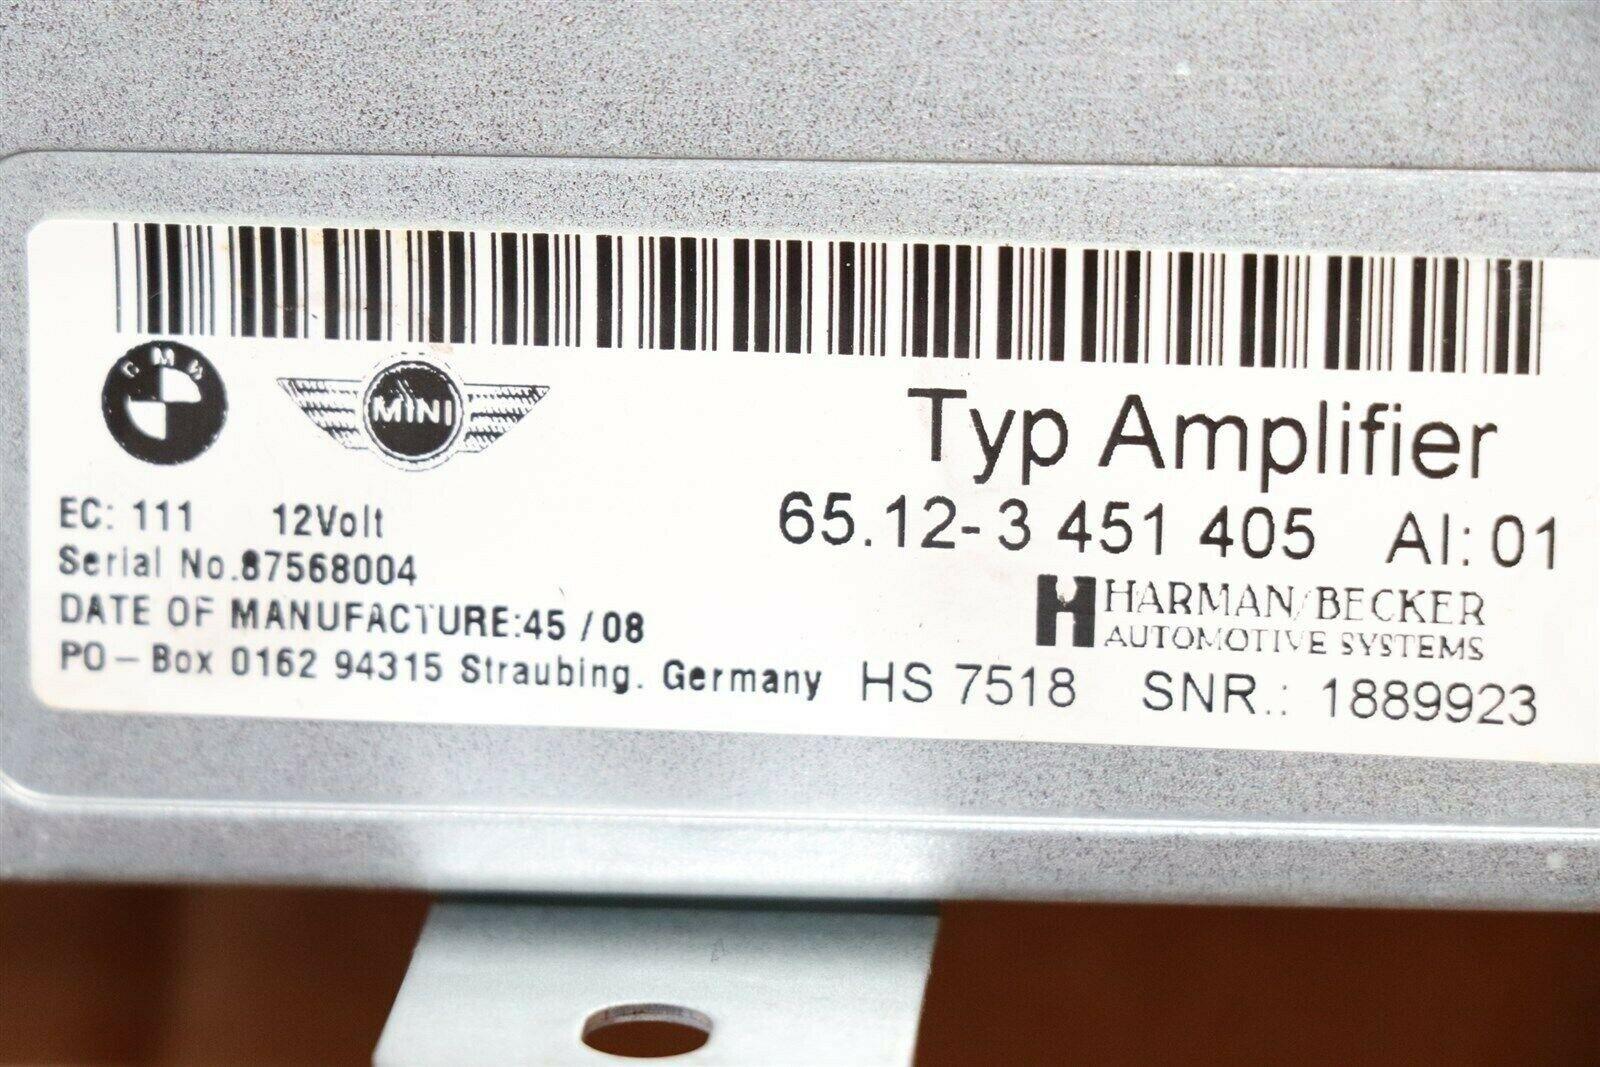 07-09 BMW Mini Cooper Harman/Becker Radio Stereo Amplifier Amp 65.12-3 451 405